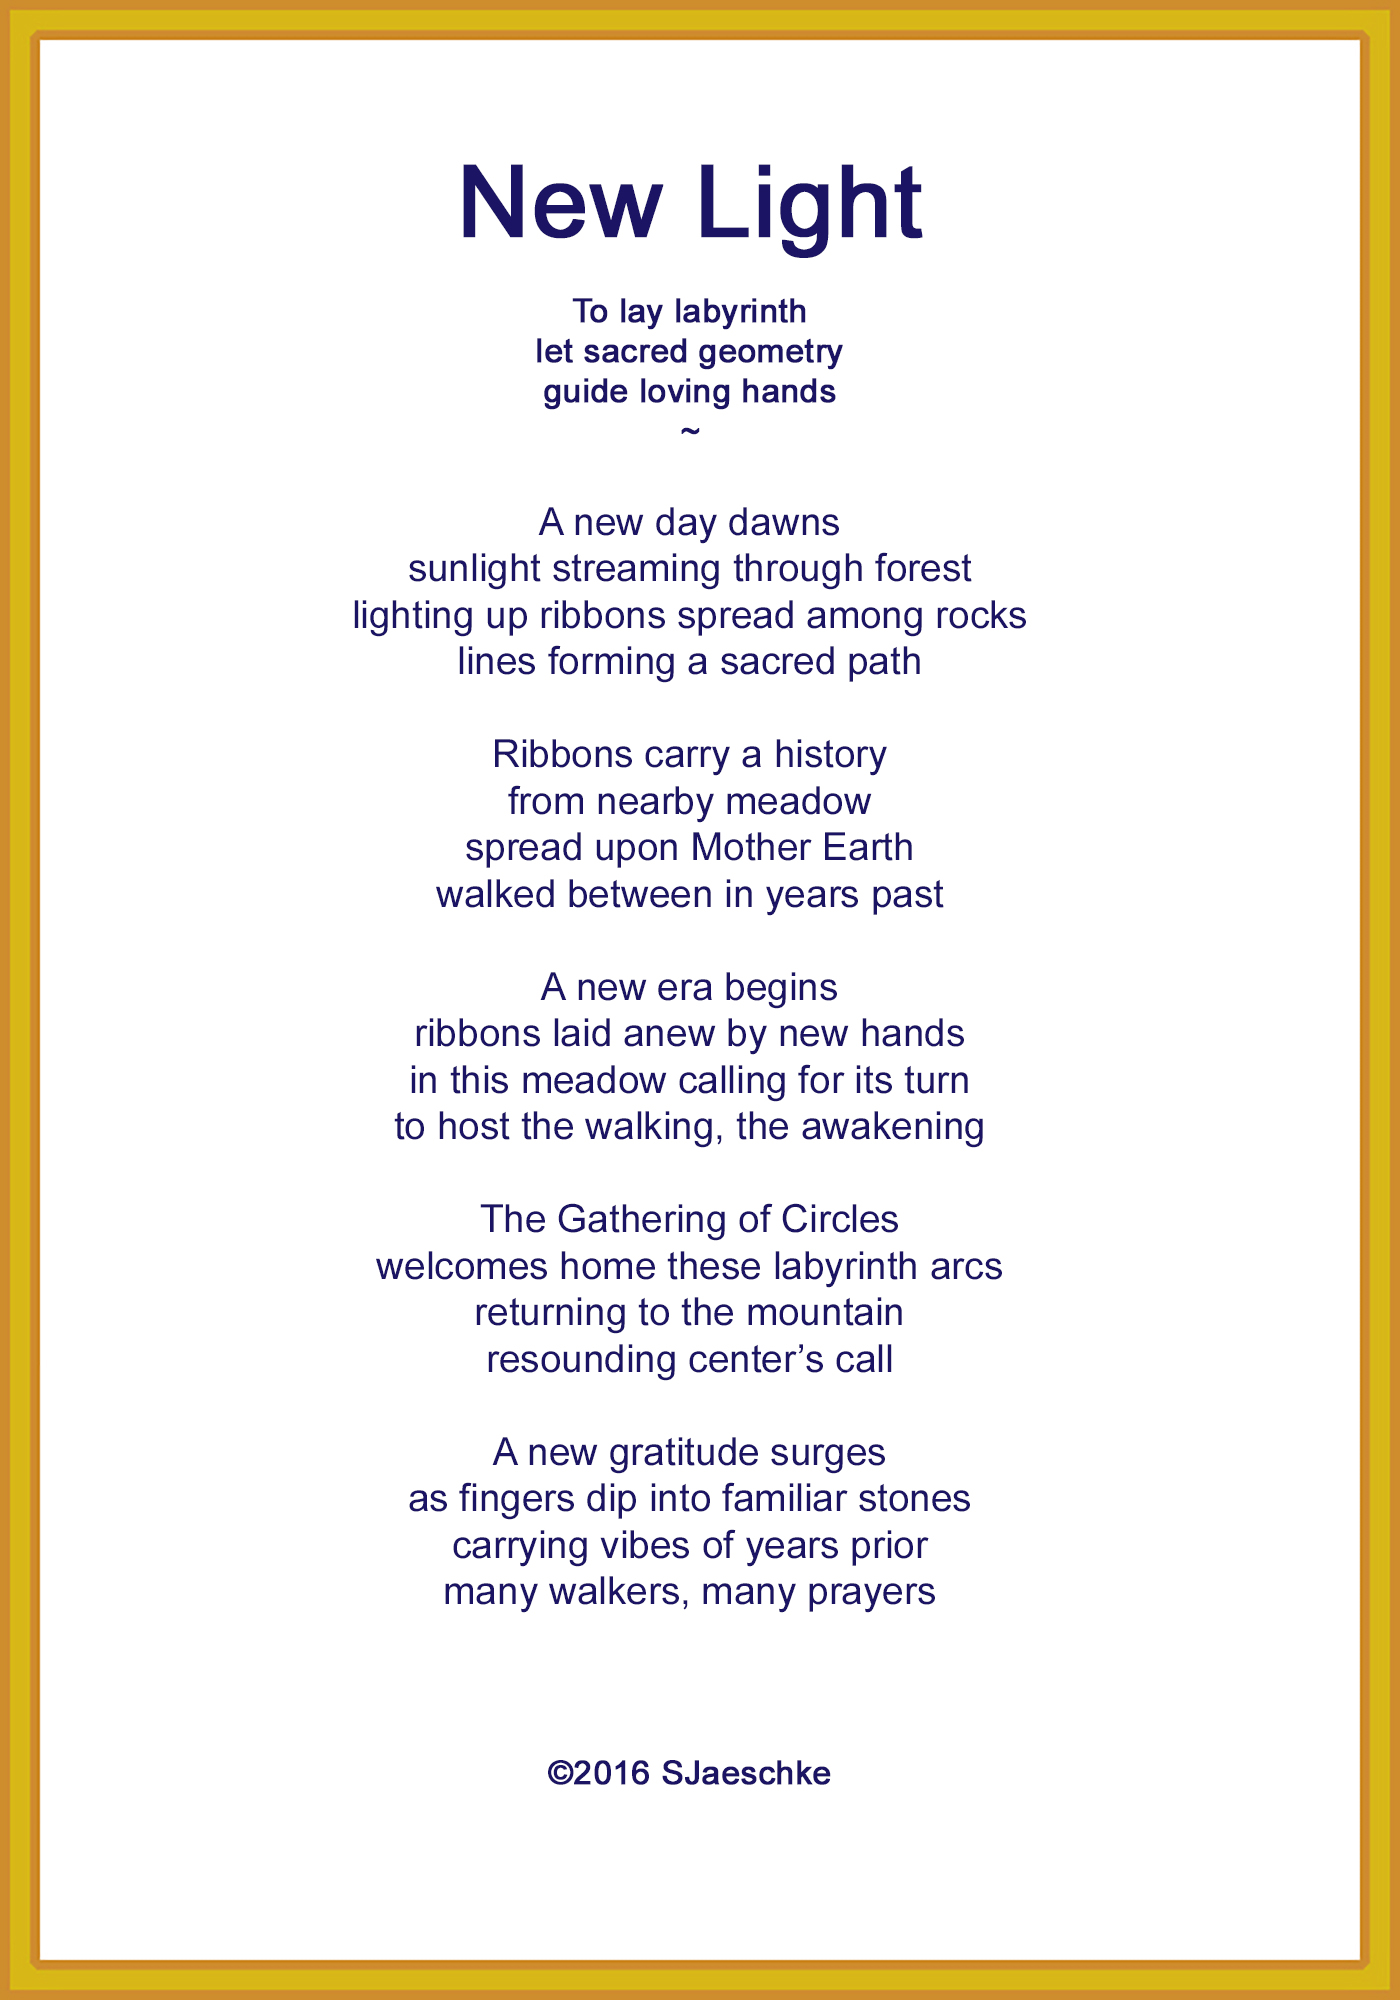 Post_2016-08-16_Poem_NewLight